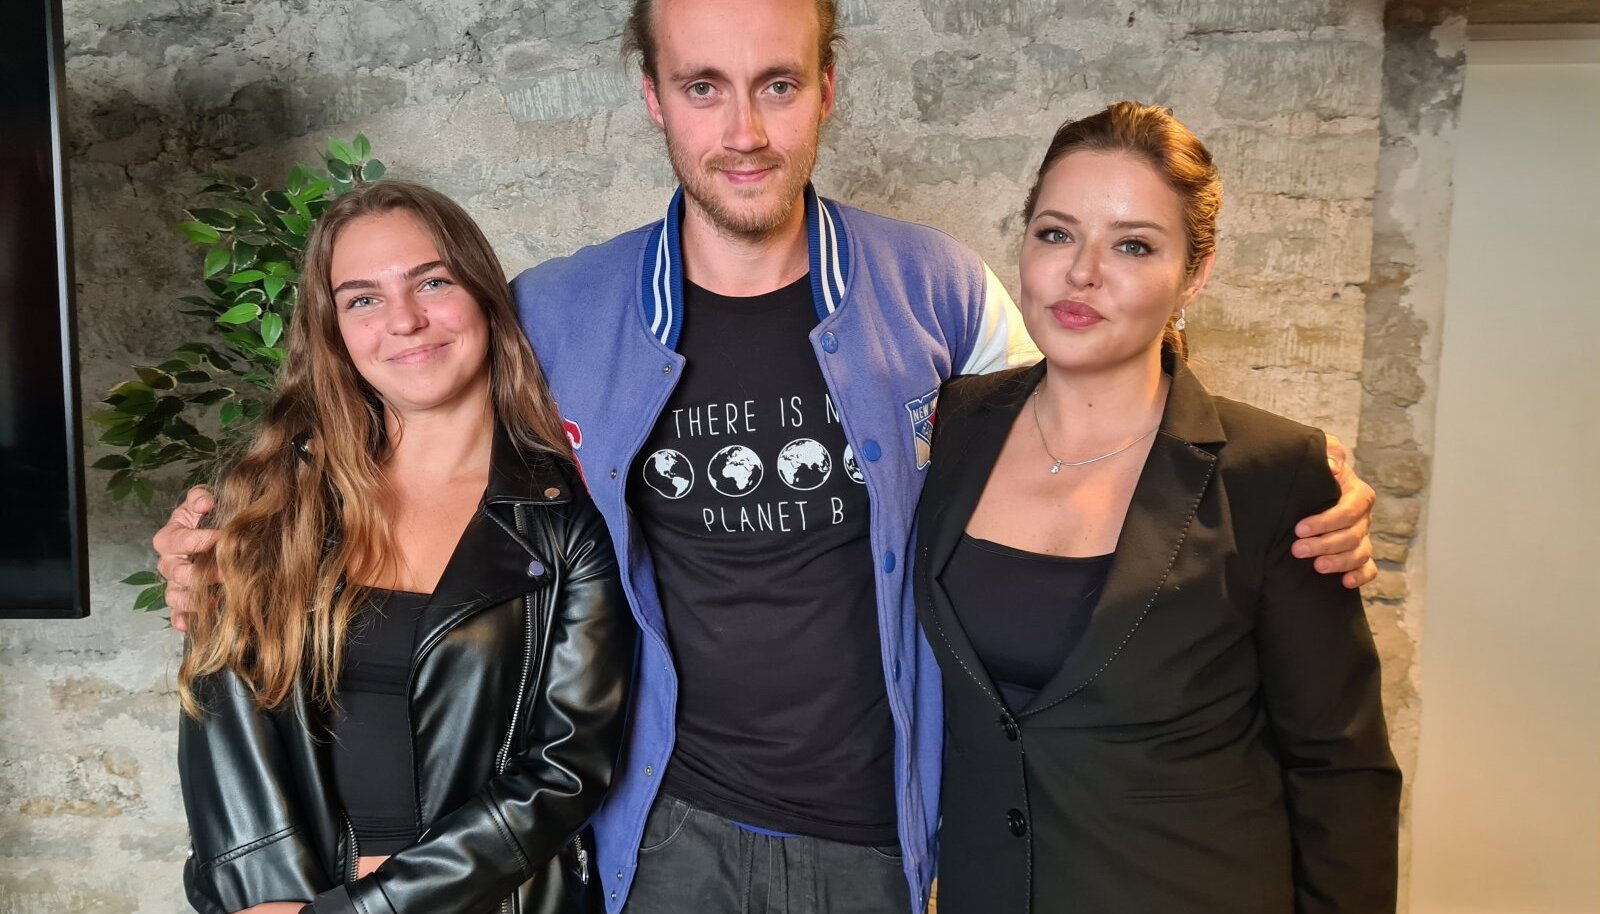 Elise Lomp, Chris Kala, Marju Karin